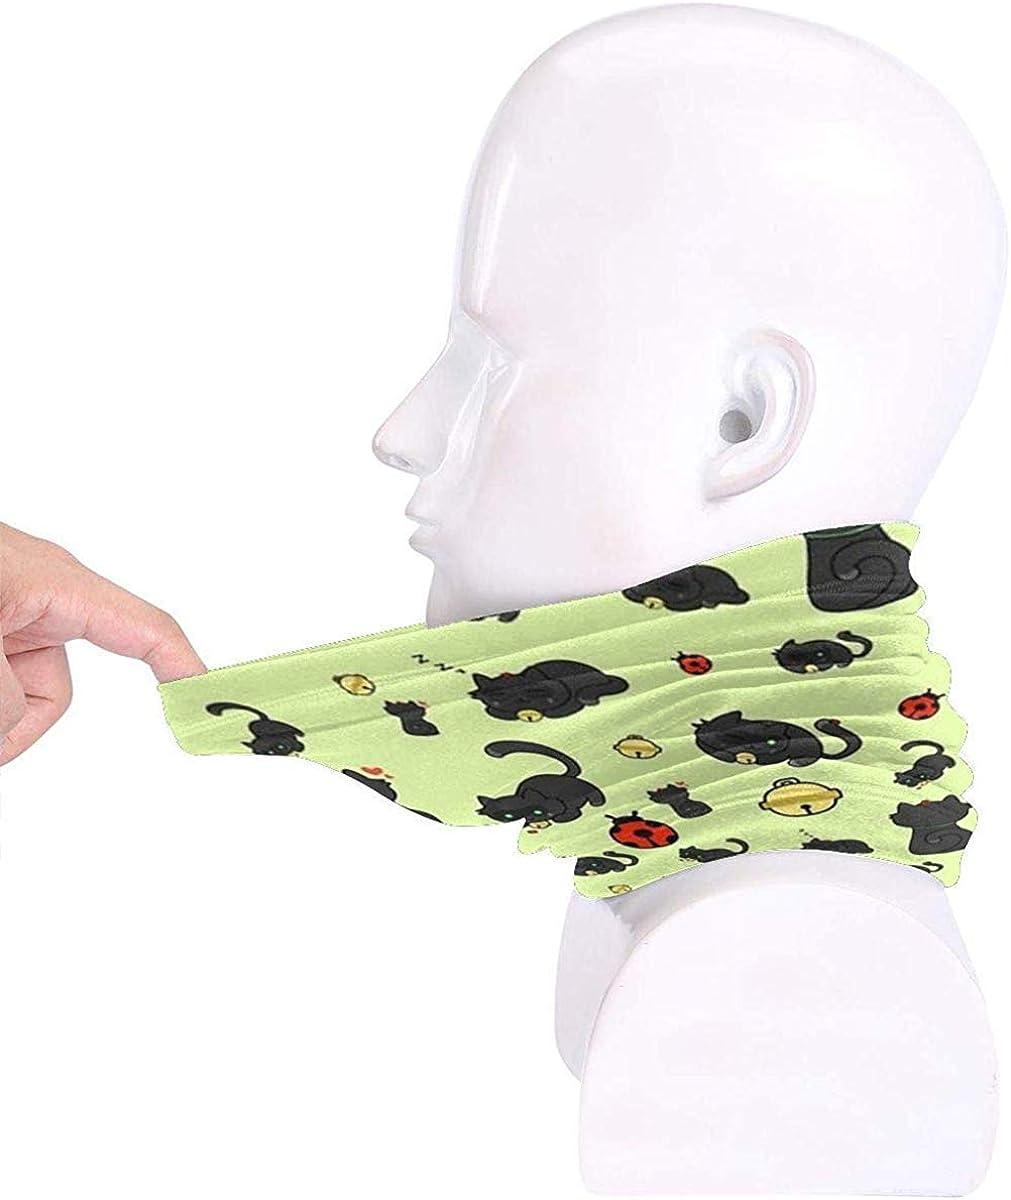 Ladybug And The Cat Microfiber Neck Warmer Balaclavas Soft Fleece Headwear Face Scarf Mask For Winter